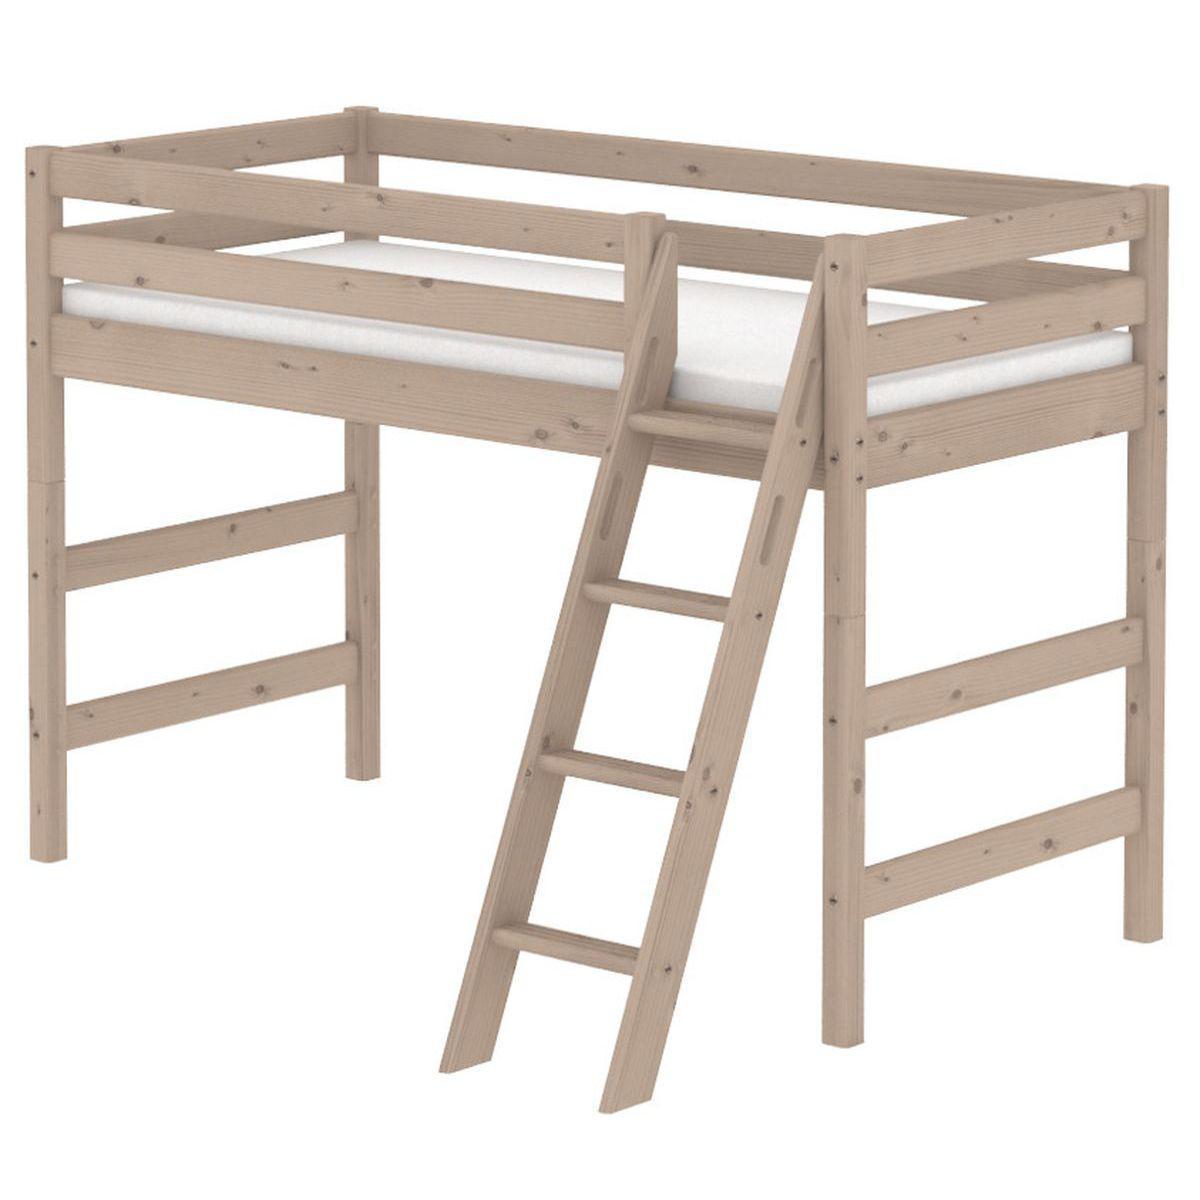 Cama semi alta 90x190 CLASSIC Flexa escalera inclinada terra